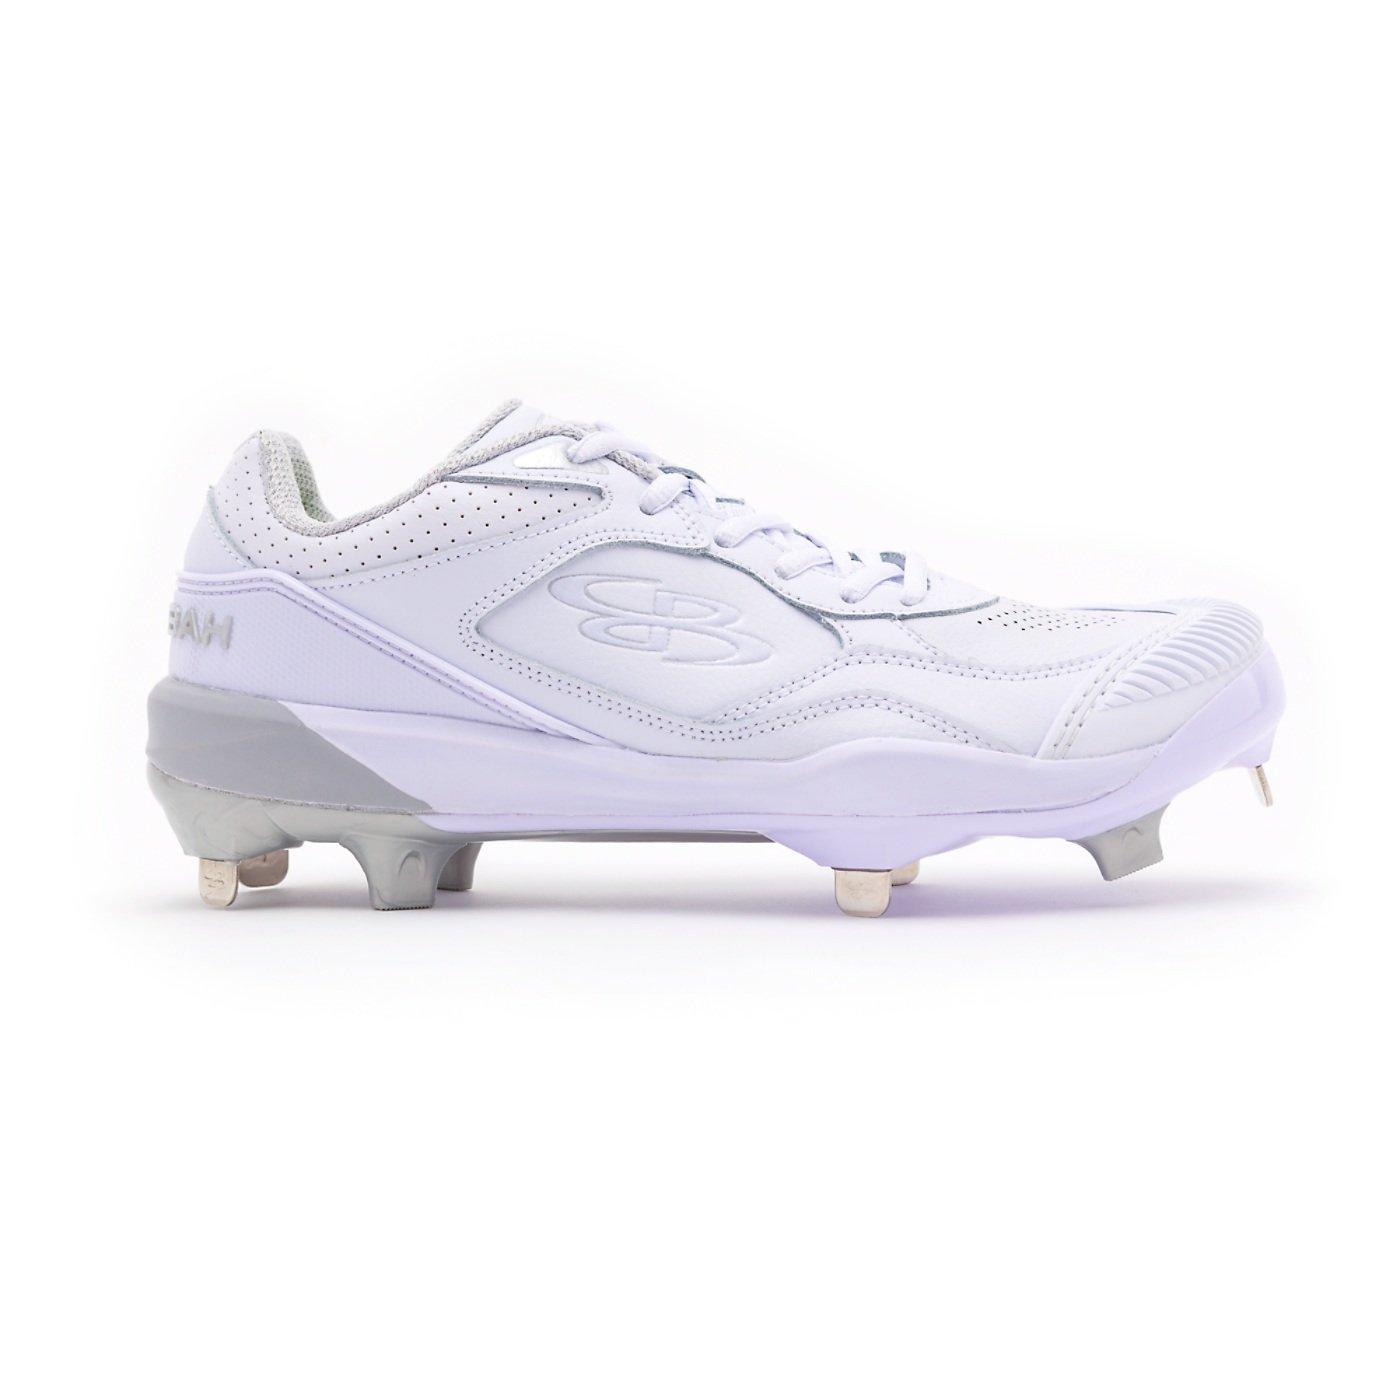 Boombah Women's Endura Pitcher's Toe Metal Cleats White/White - Size 8